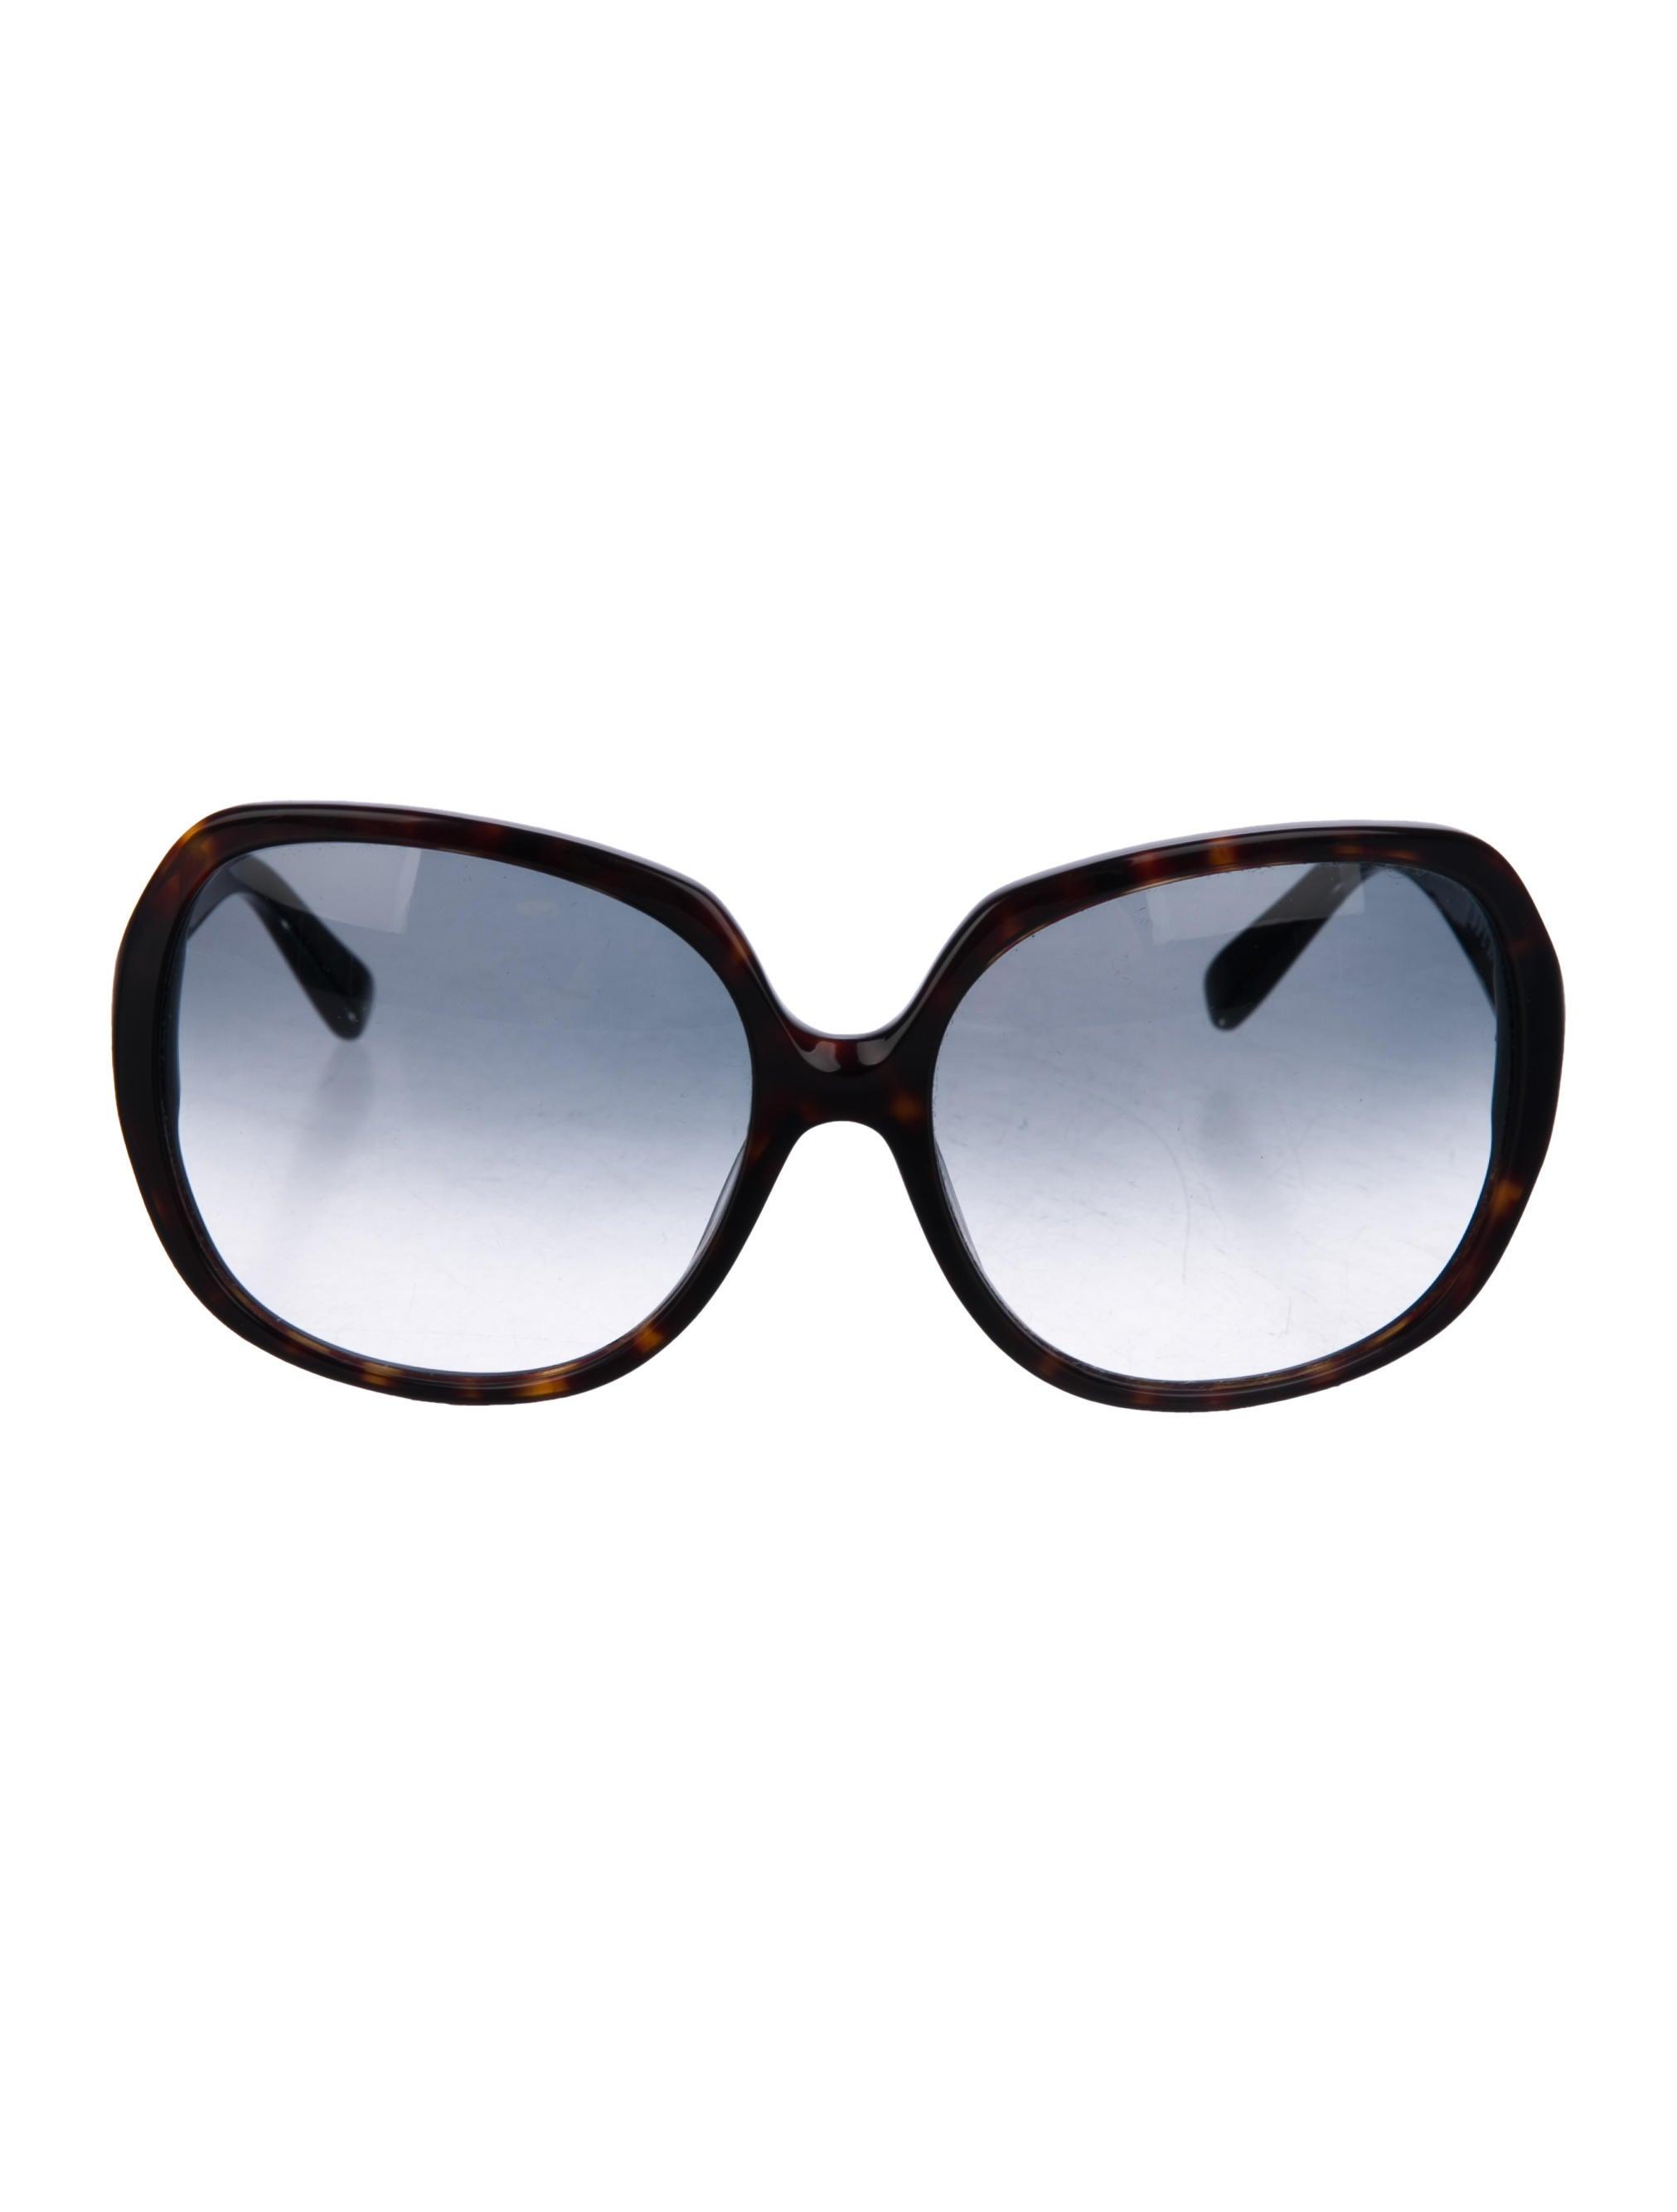 d996feab3a6f Dita Supadupa Oversize Sunglasses - Accessories - WDT21003